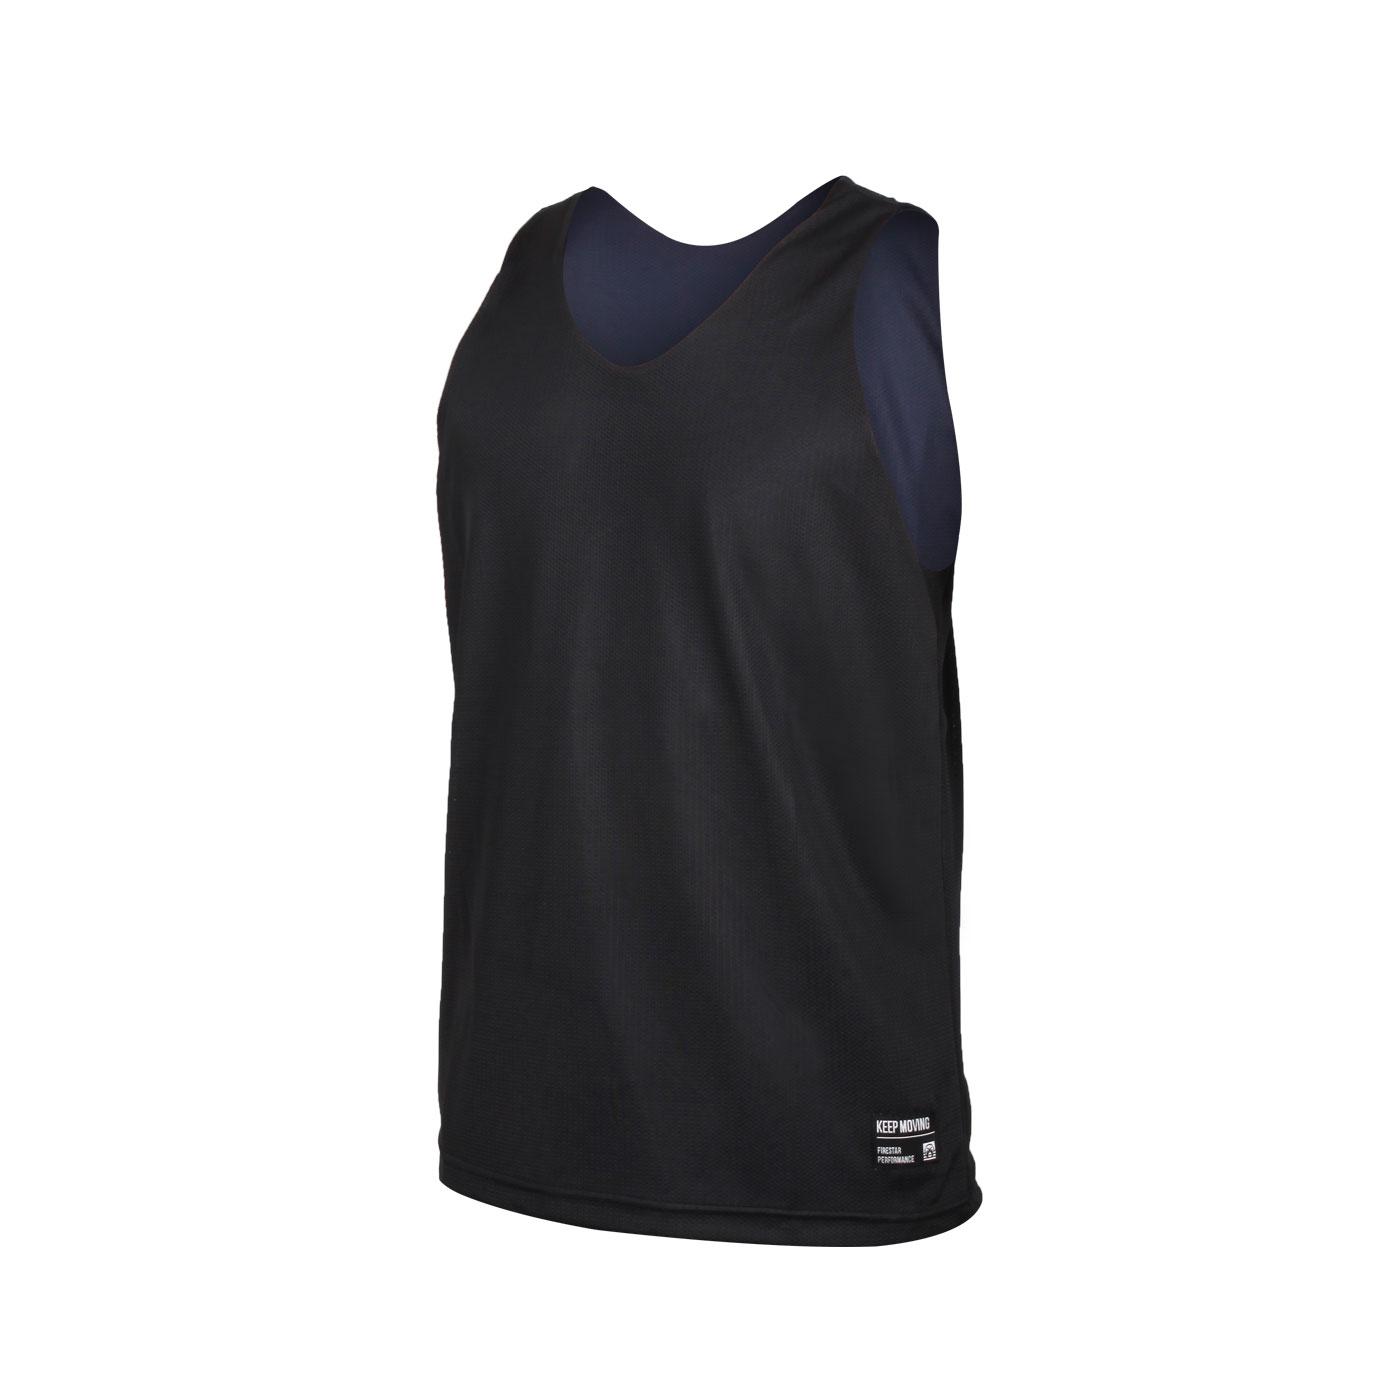 FIRESTAR 男款雙面訓練籃球背心 B1707-10 - 黑丈青